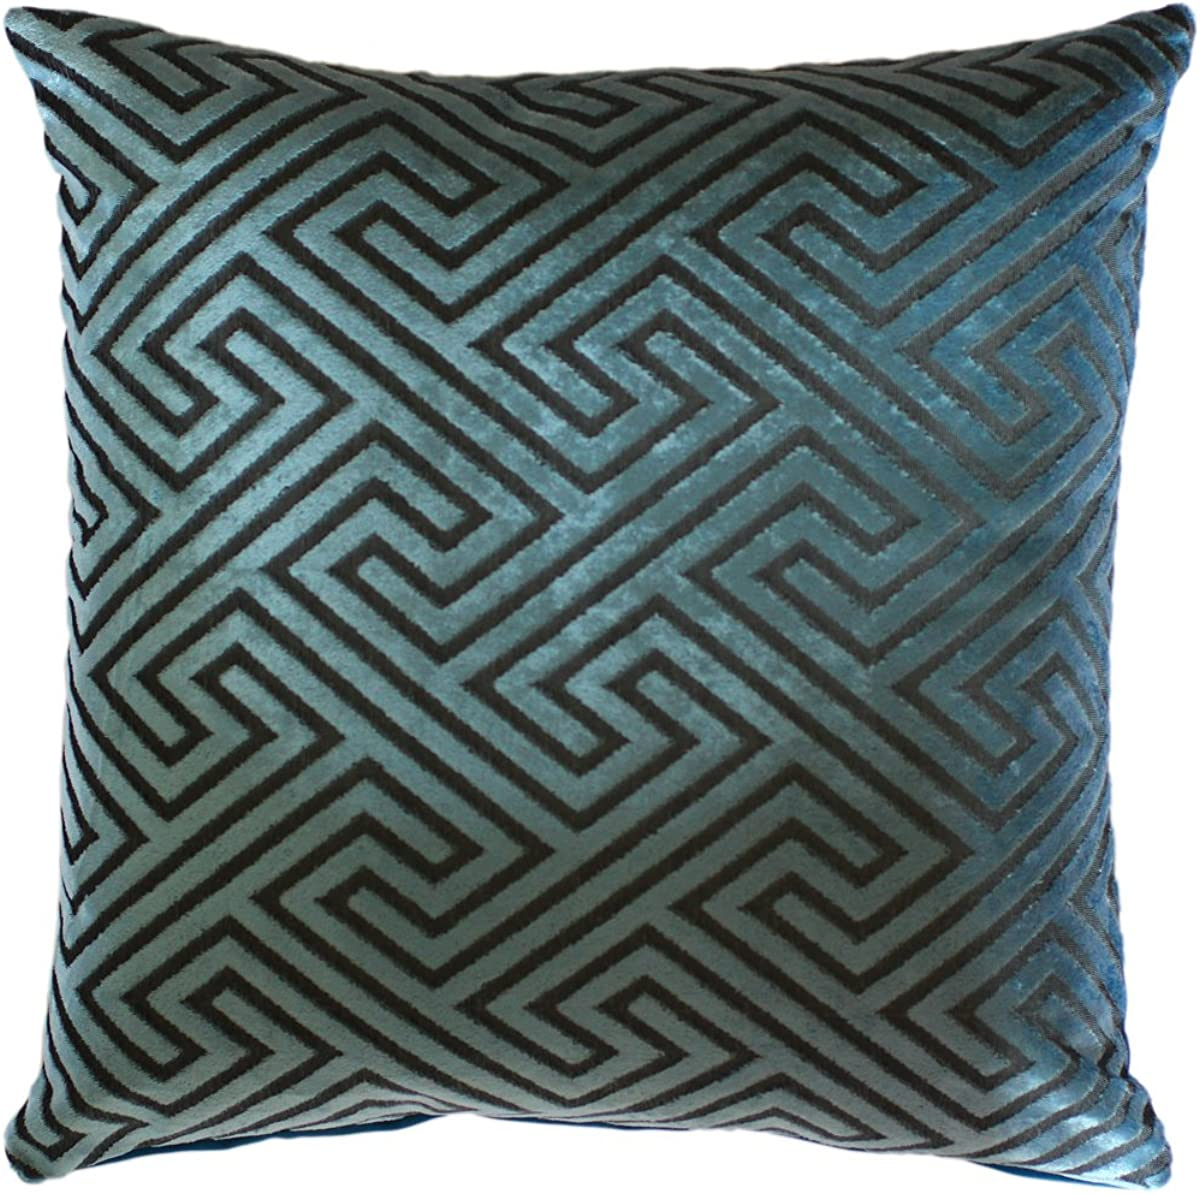 "Greek Key Design Chenille Velvet Print 16"" X 16"" Cushion Covers Pillow Sofa Bed Home, Furniture & DIY"